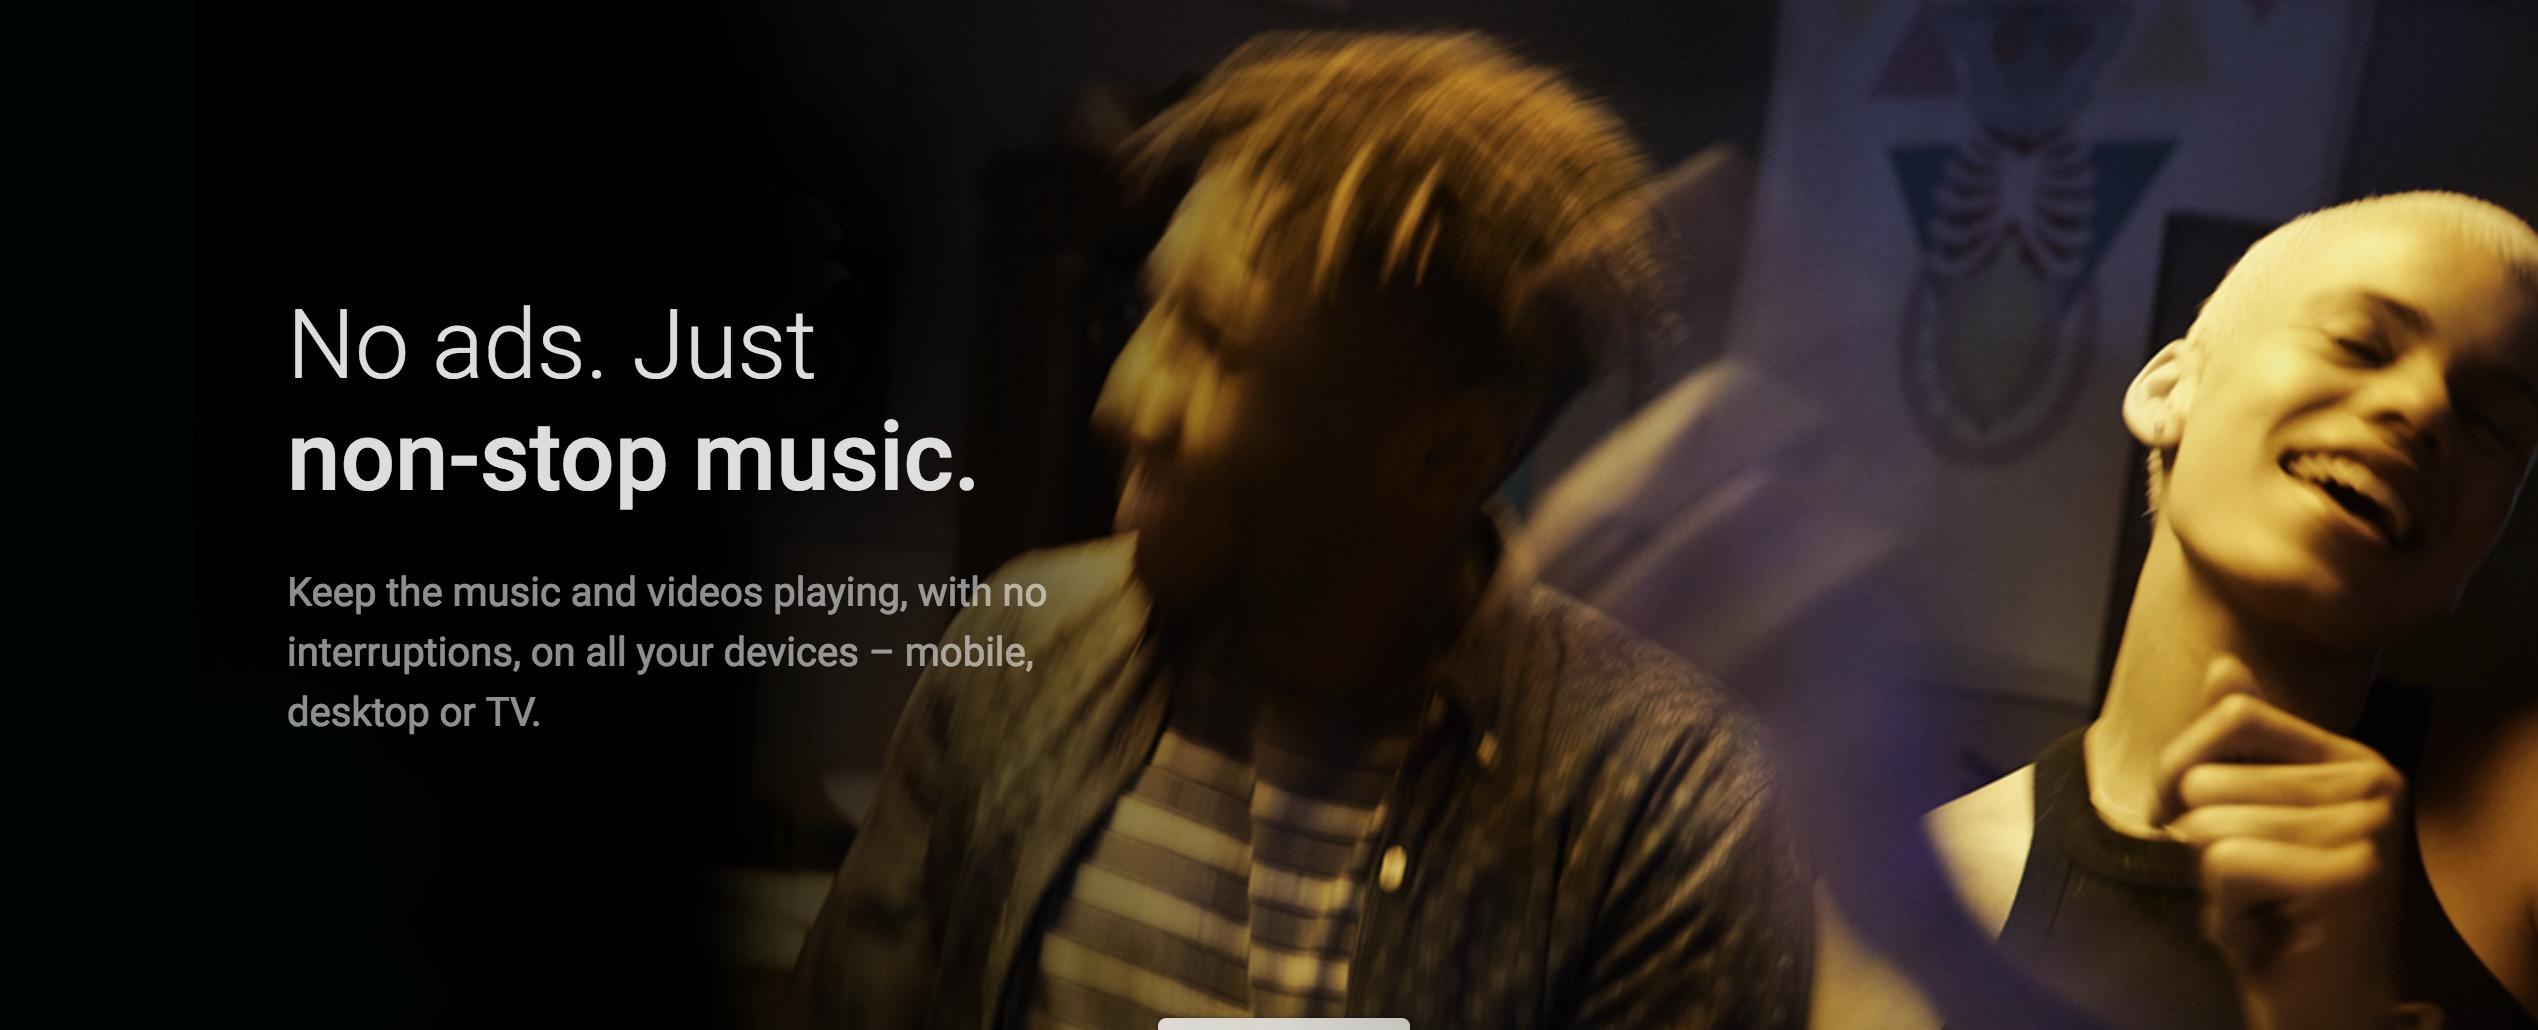 Google Announces New YouTube Music and YouTube Premium